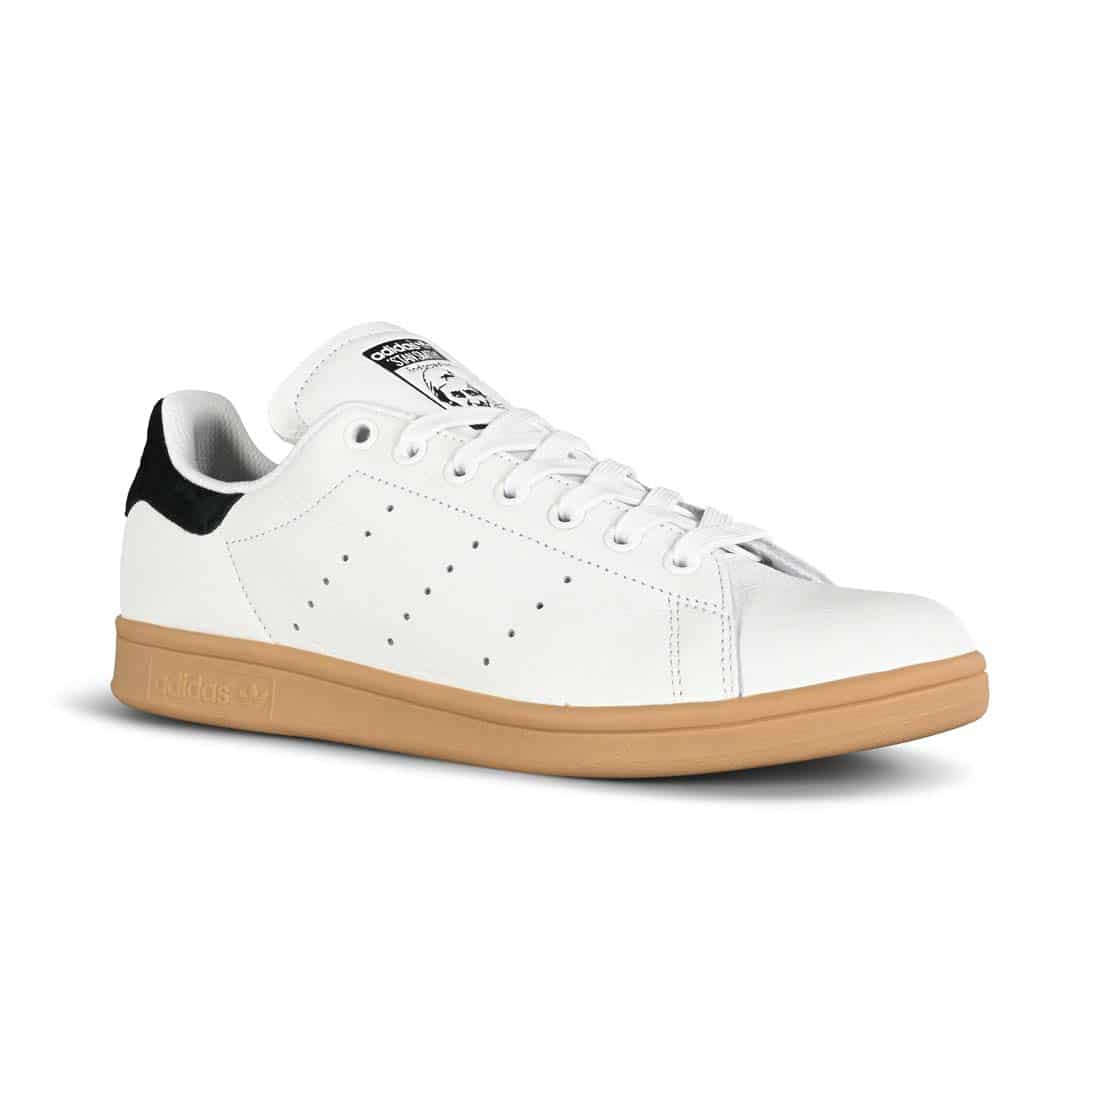 Adidas Stan Smith ADV Skate Shoes